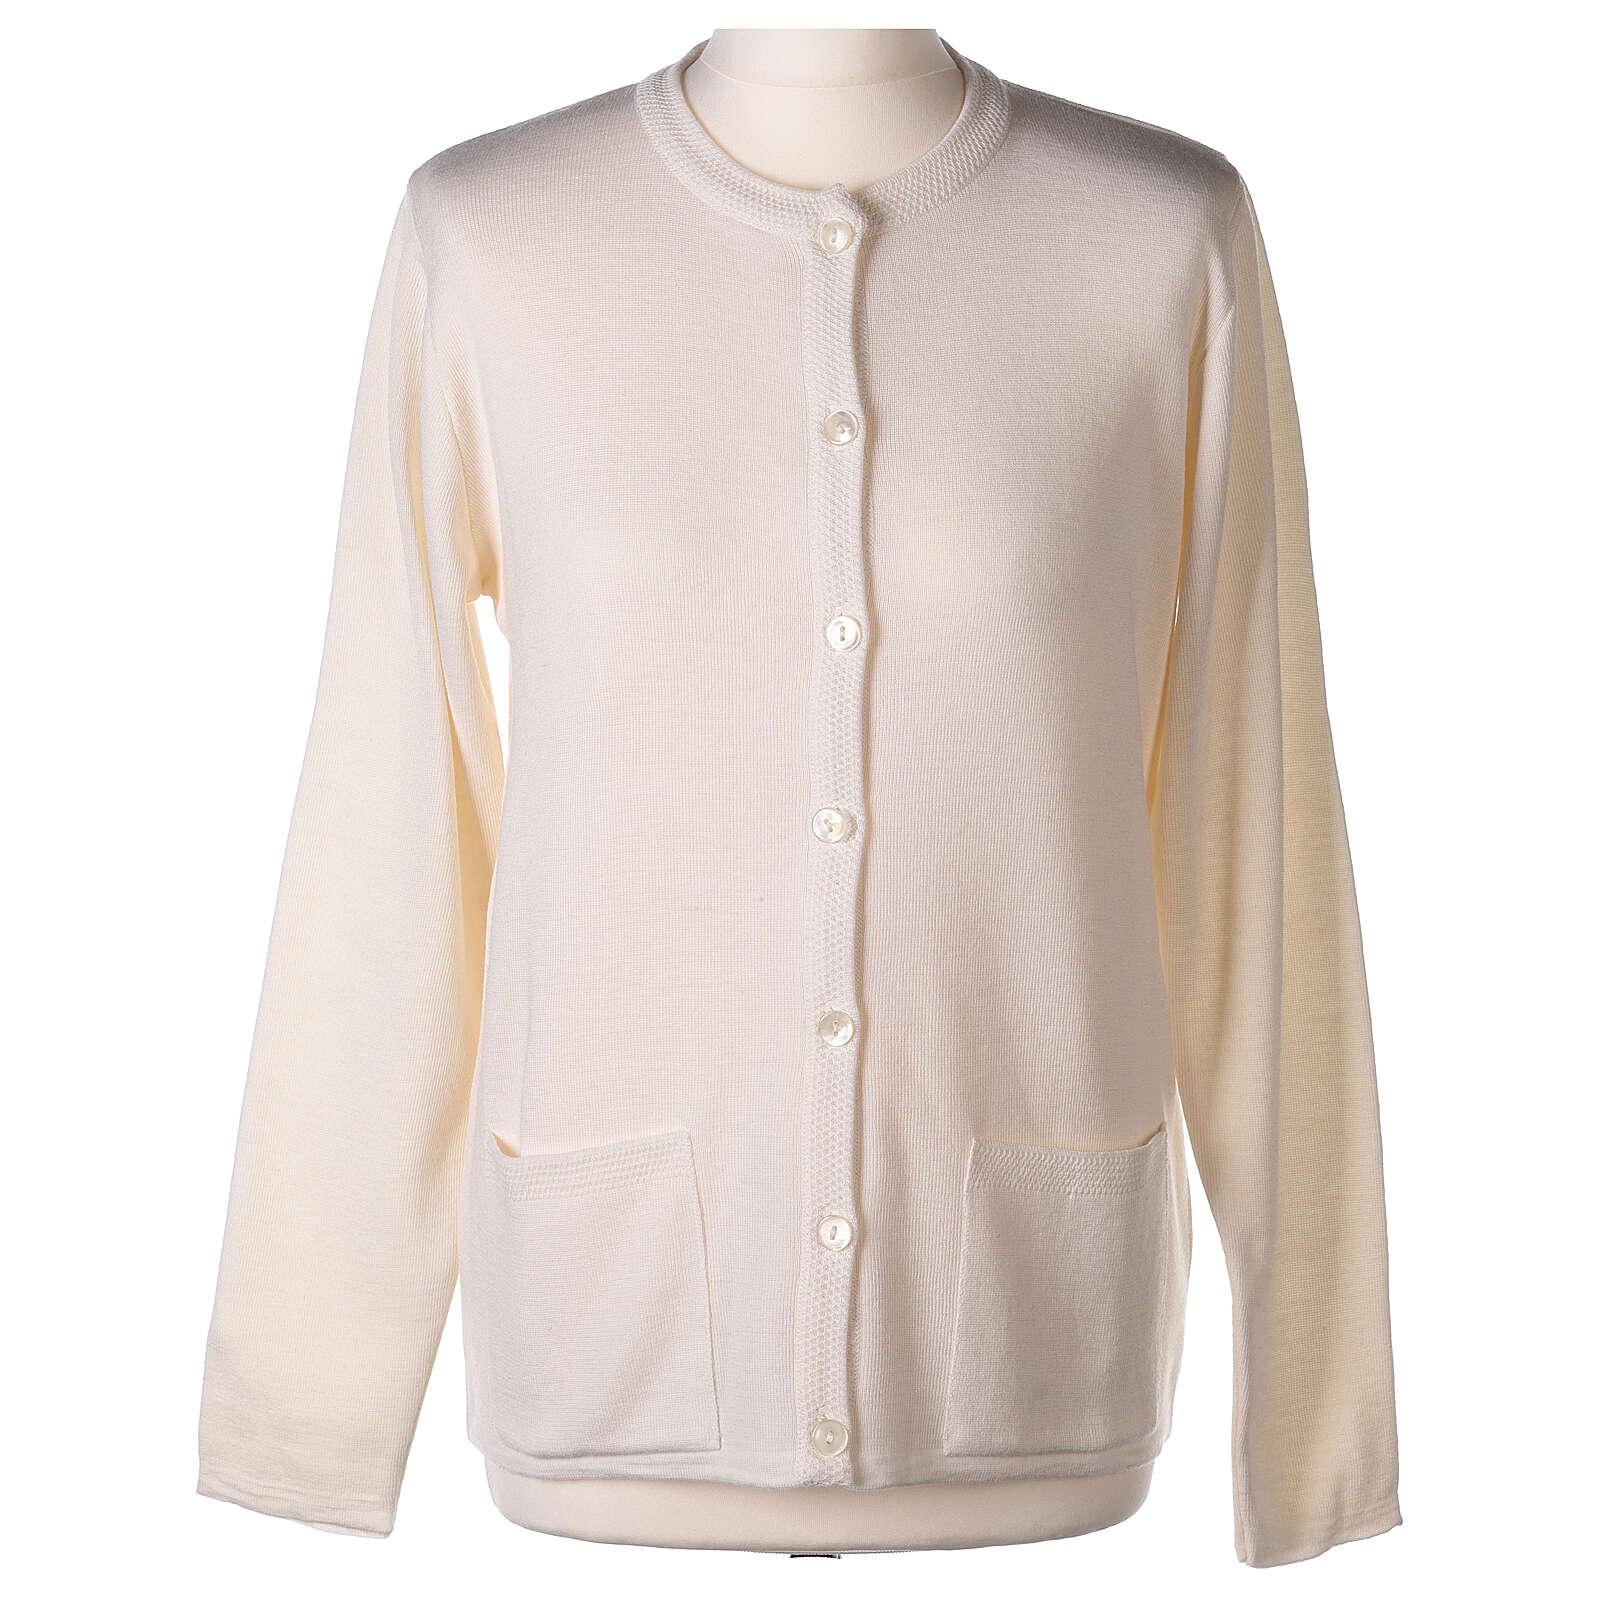 Crew neck white nun cardigan with pockets plain fabric 50% acrylic 50% merino wool In Primis 4